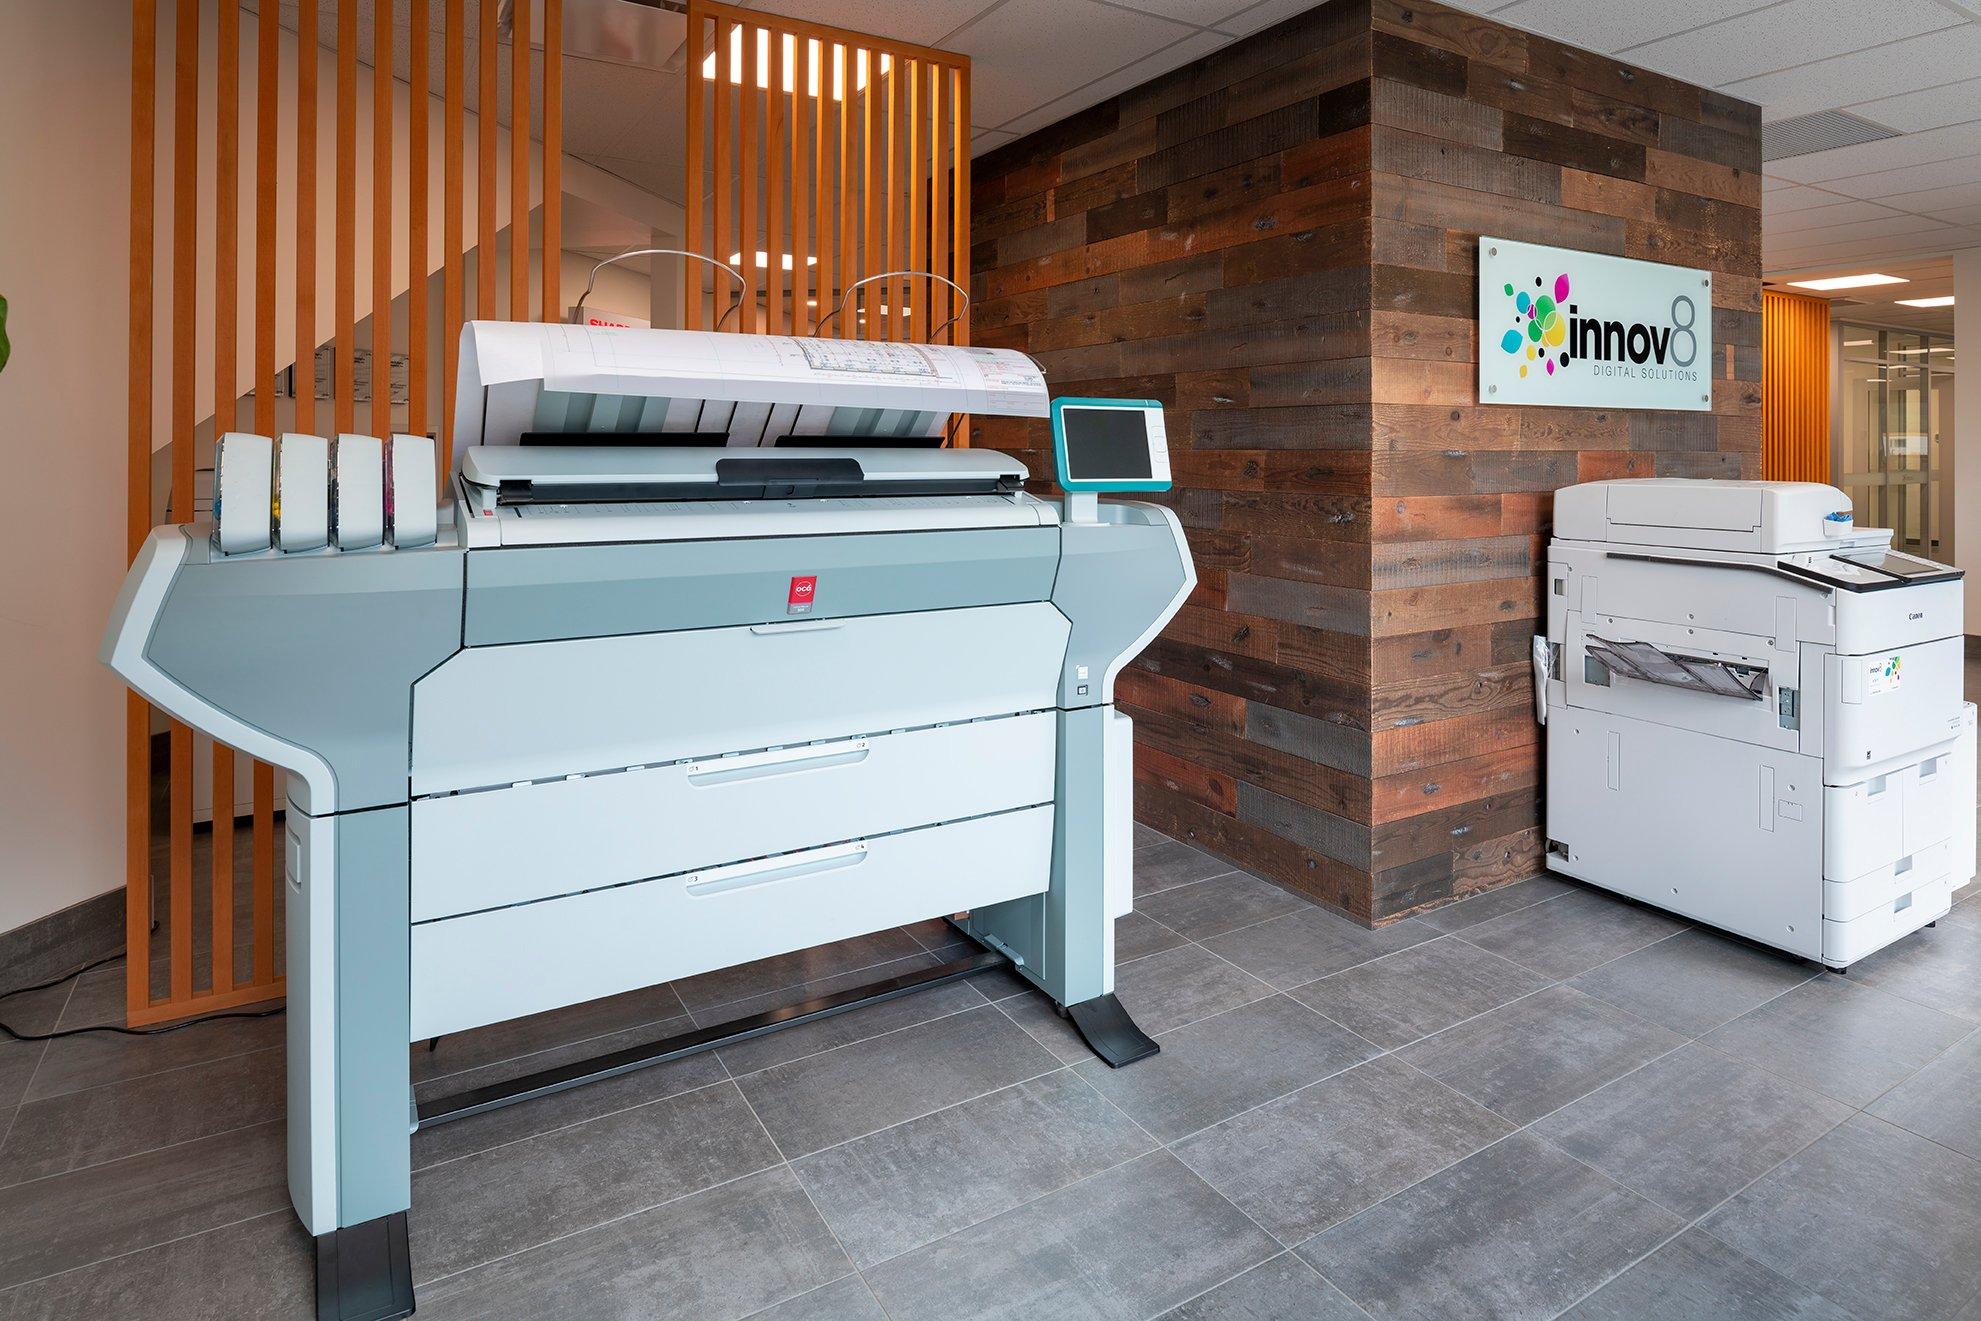 oce-and-canon-printers